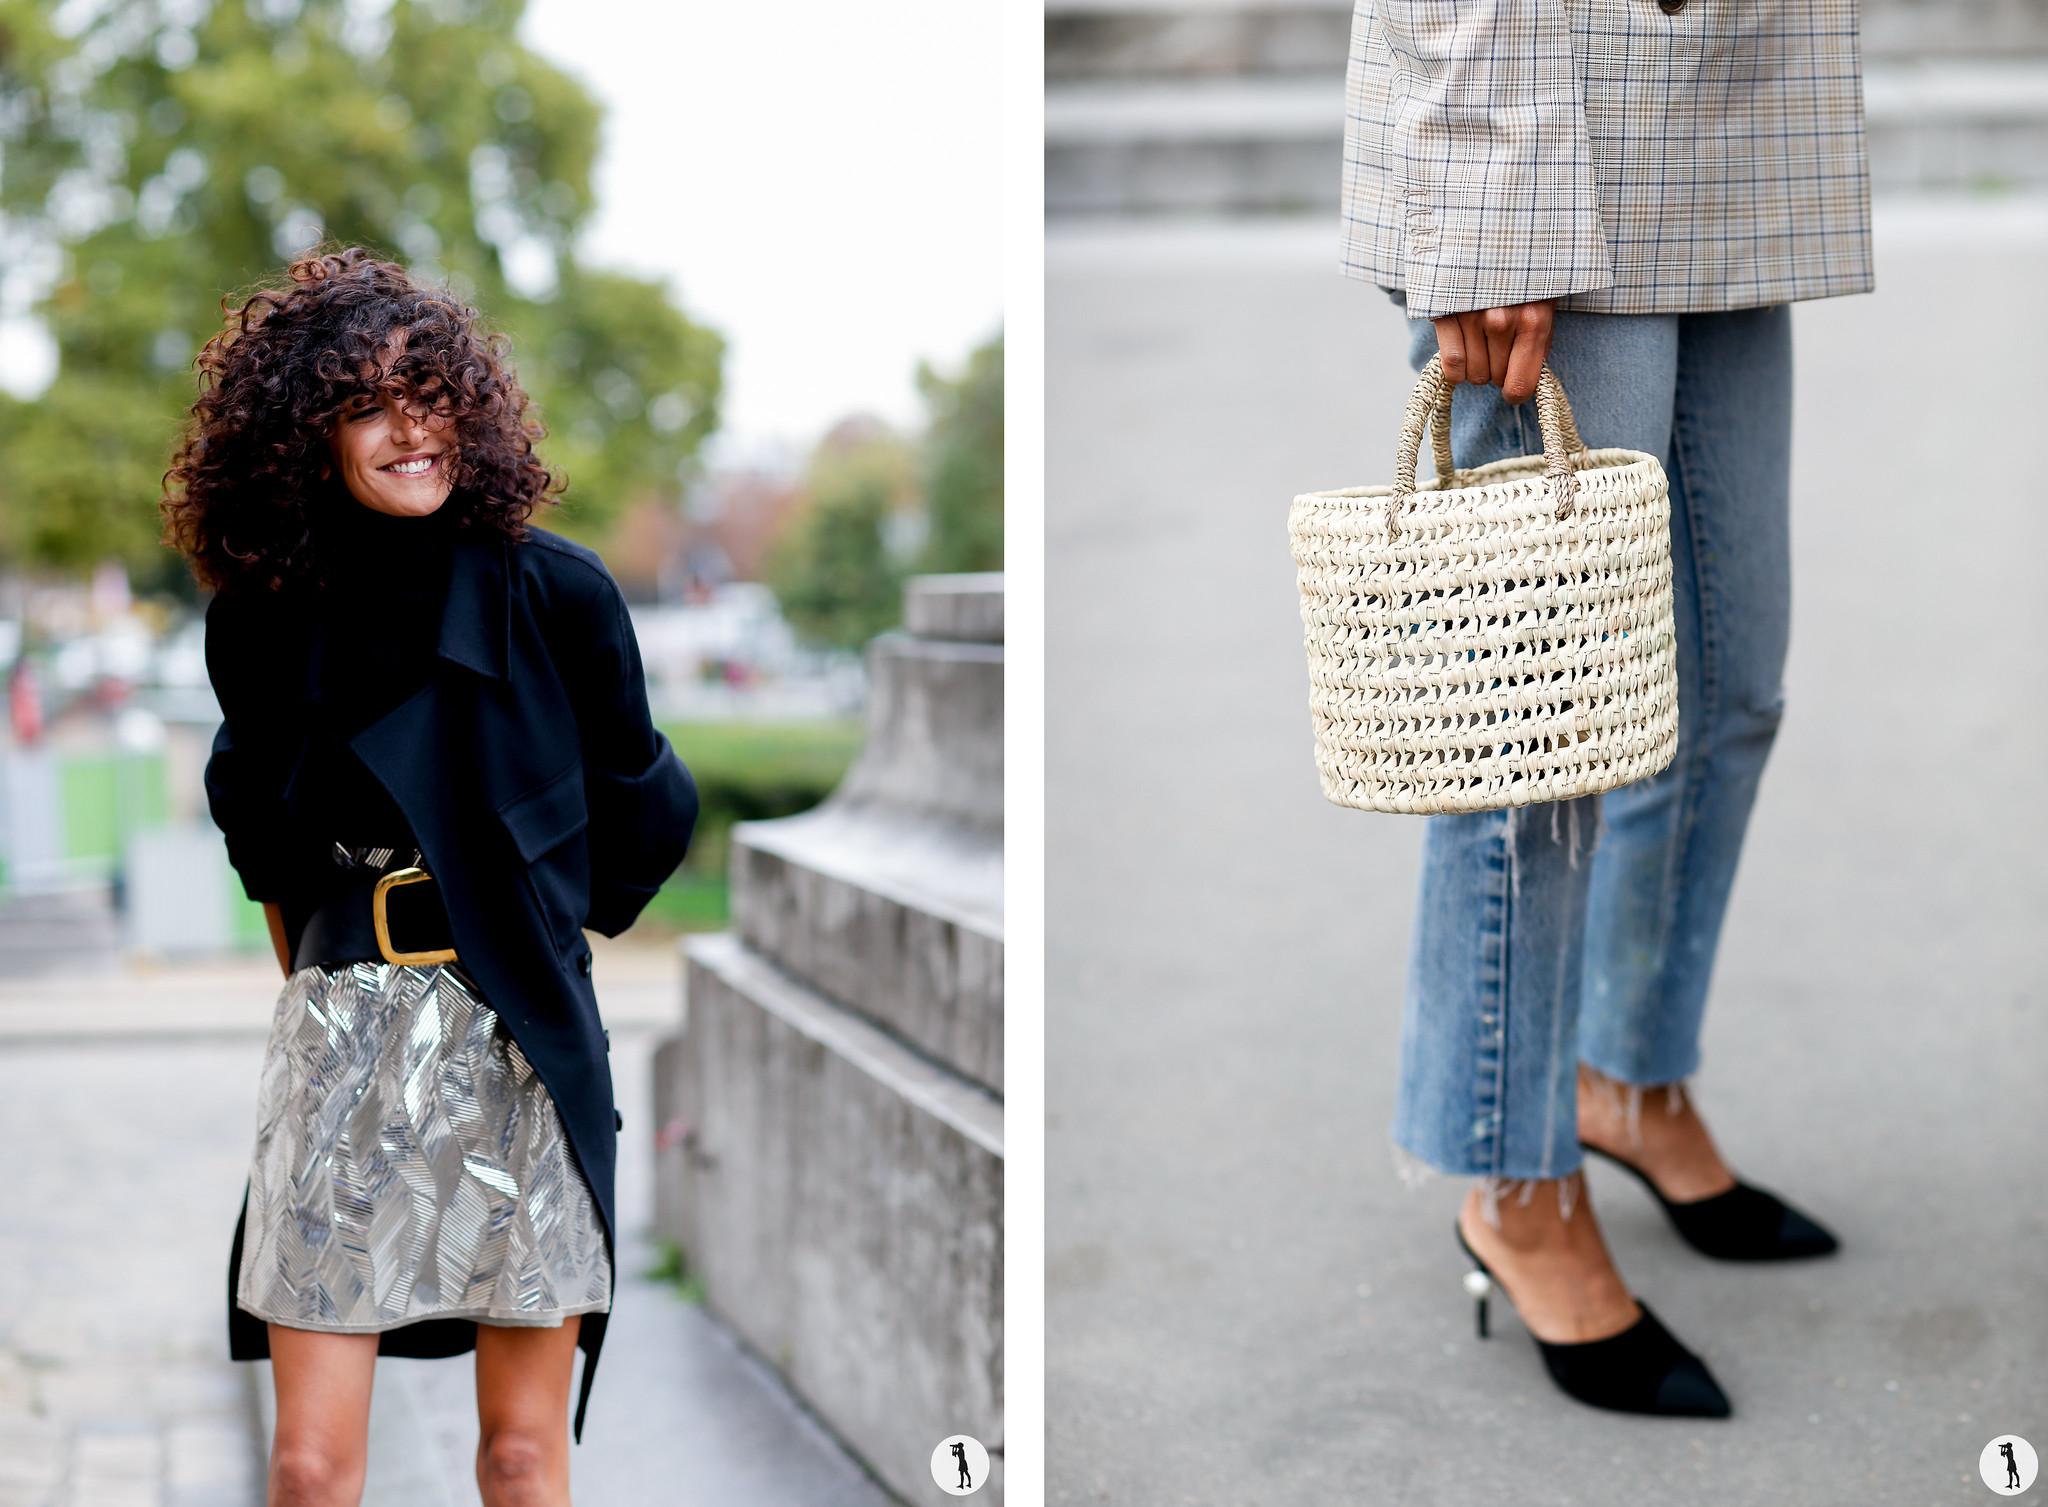 Brune Buonomano and Close up - Paris Fashion Week SS18